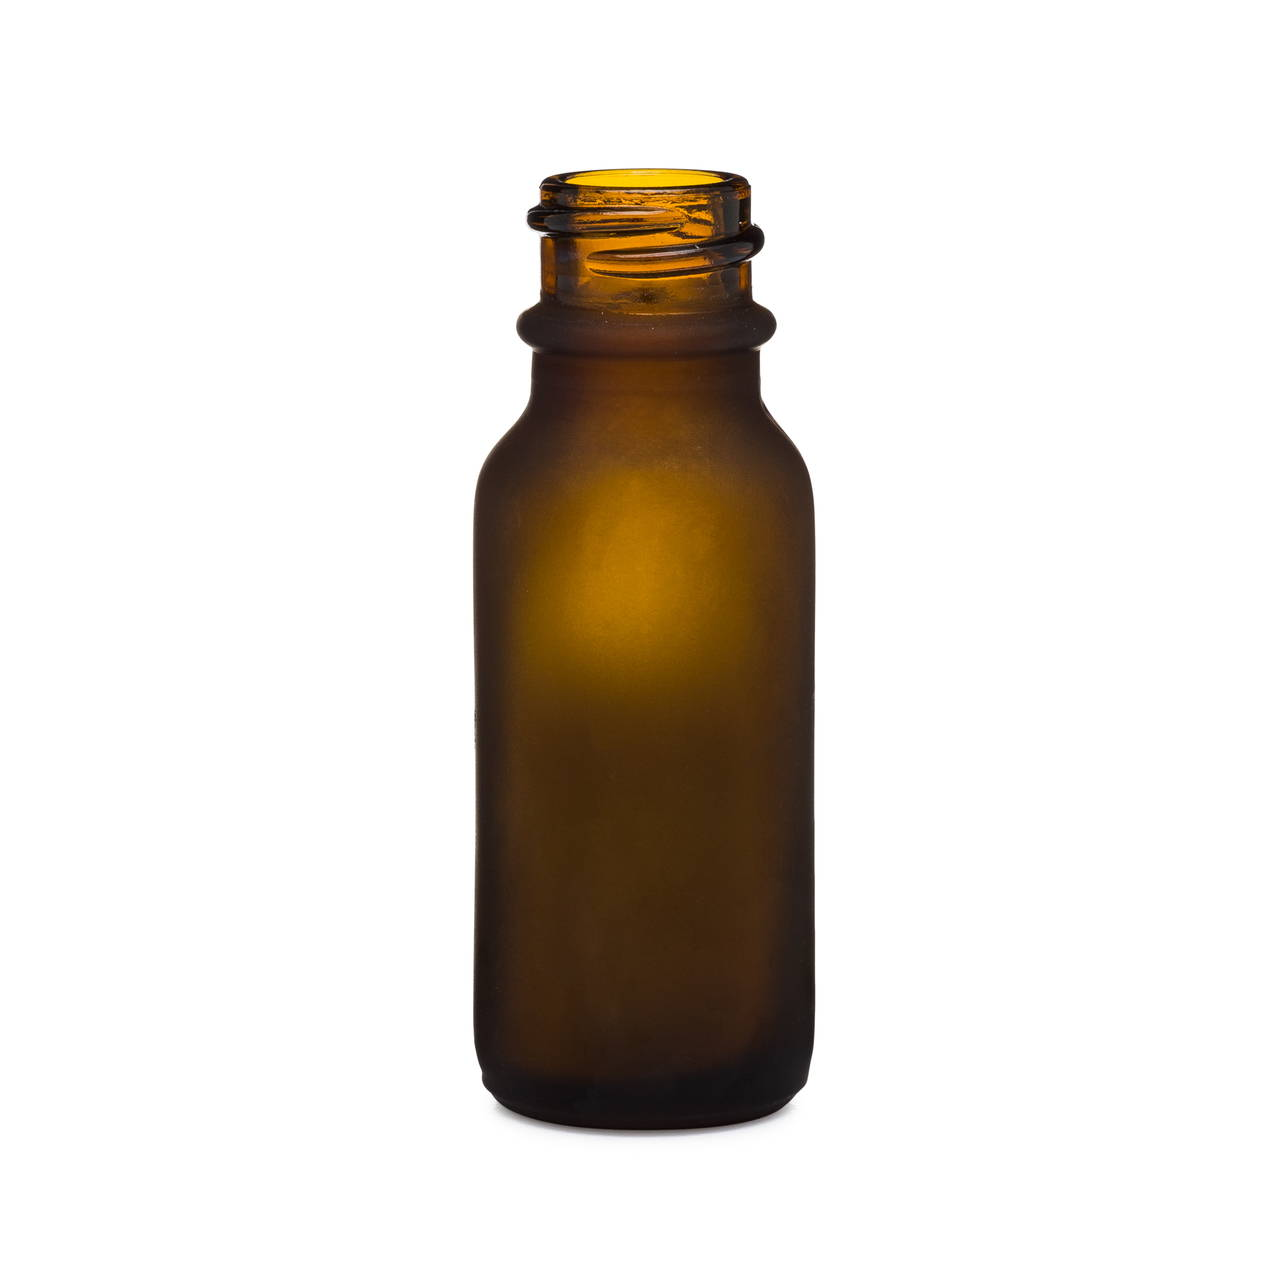 New Options for Boston Round Bottles